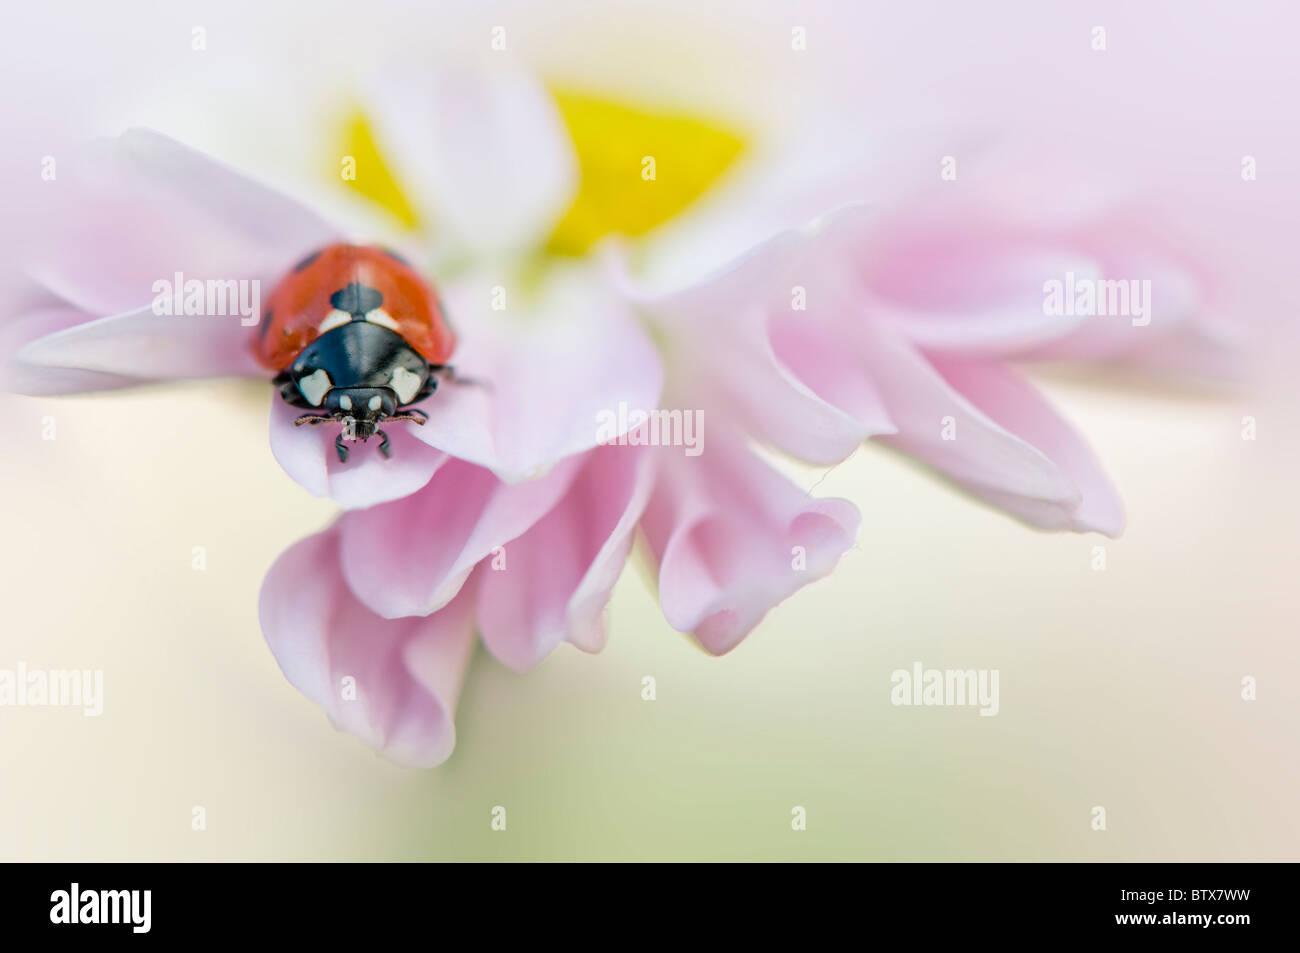 Coccinella septempunctata - Coccinella 7-punctata - 7-spot Ladybird on a pink Daisy flower - Stock Image